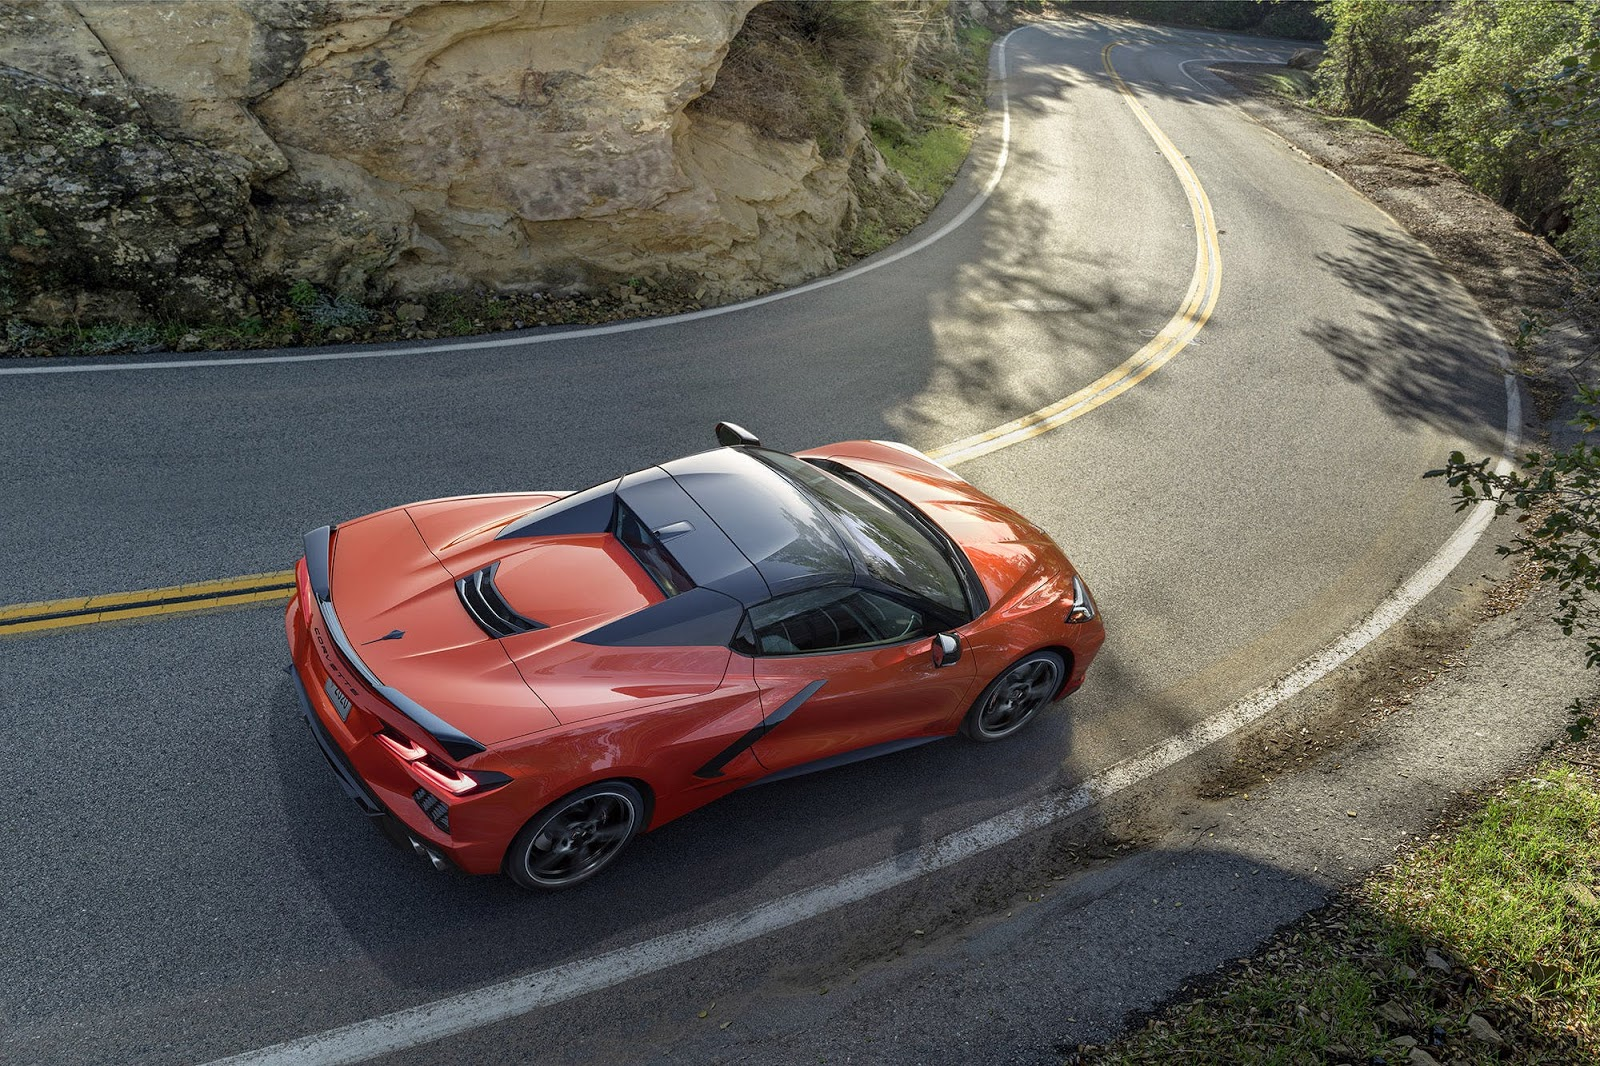 were 1 Γιατί η C8 Convertible είναι η καλύτερη Corvette ever C8, Chevrolet, Chevrolet Corvette, Corvette, zblog, ειδήσεις, καινούργιο, καινούρια, καινούριο